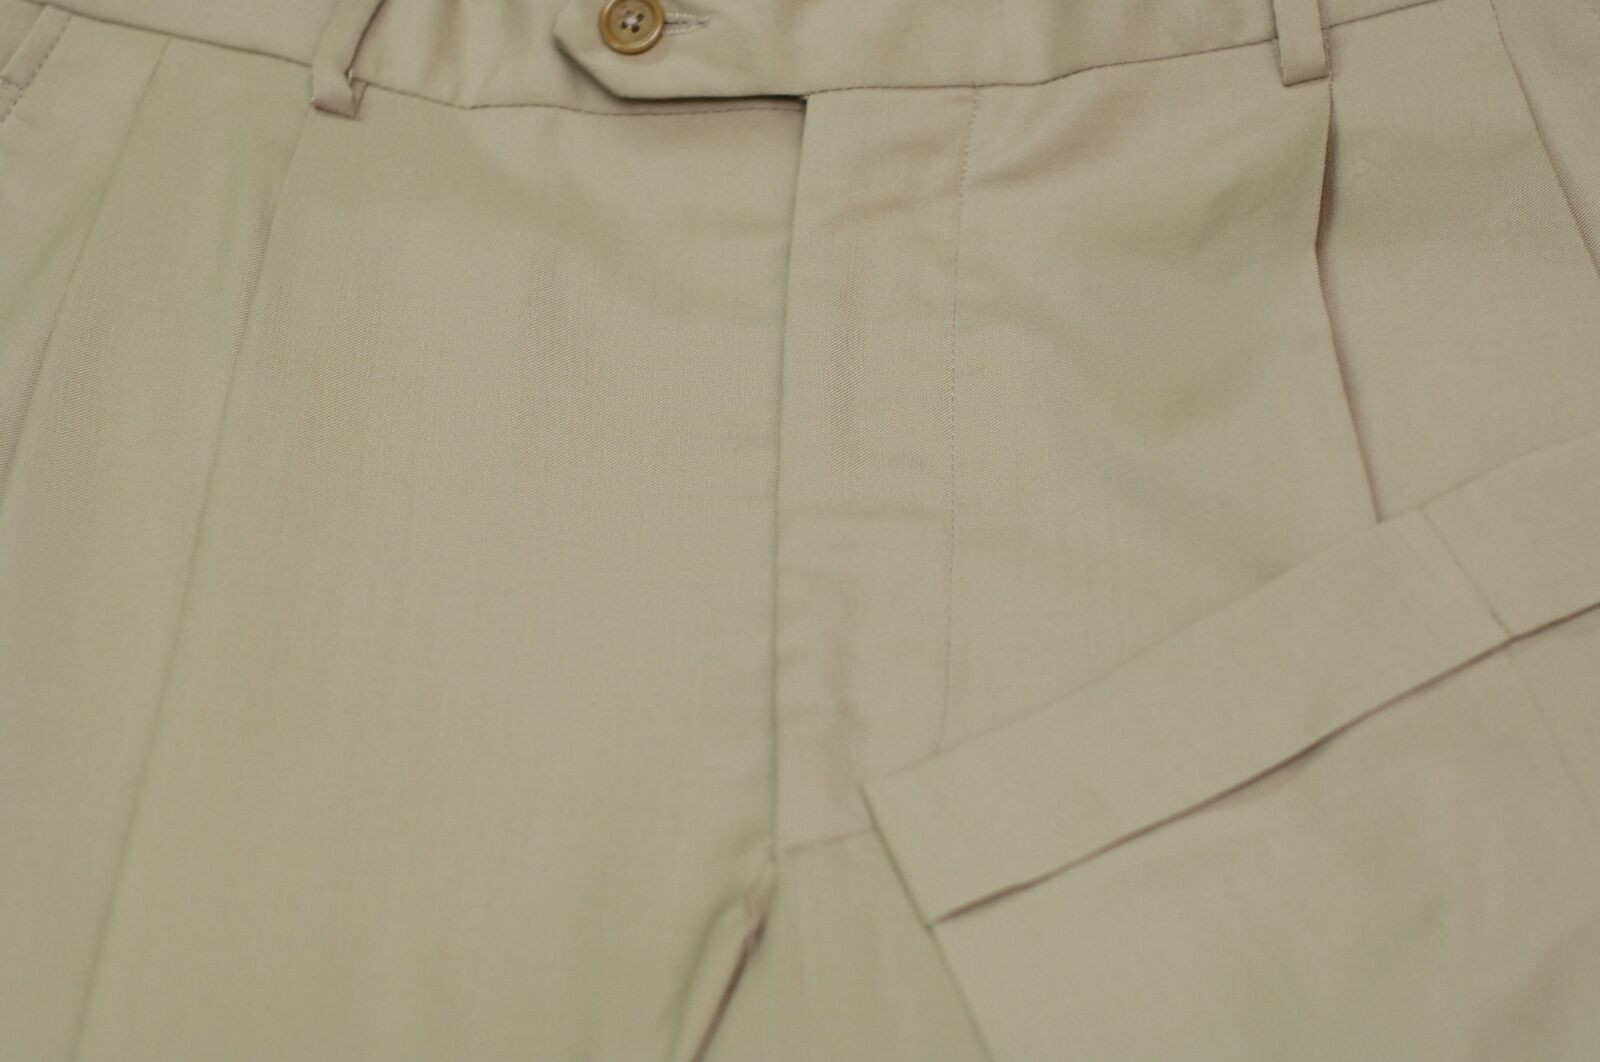 Sullivan Ryan Men's British Tan Made In  Wool Dress Pants 34 x 30